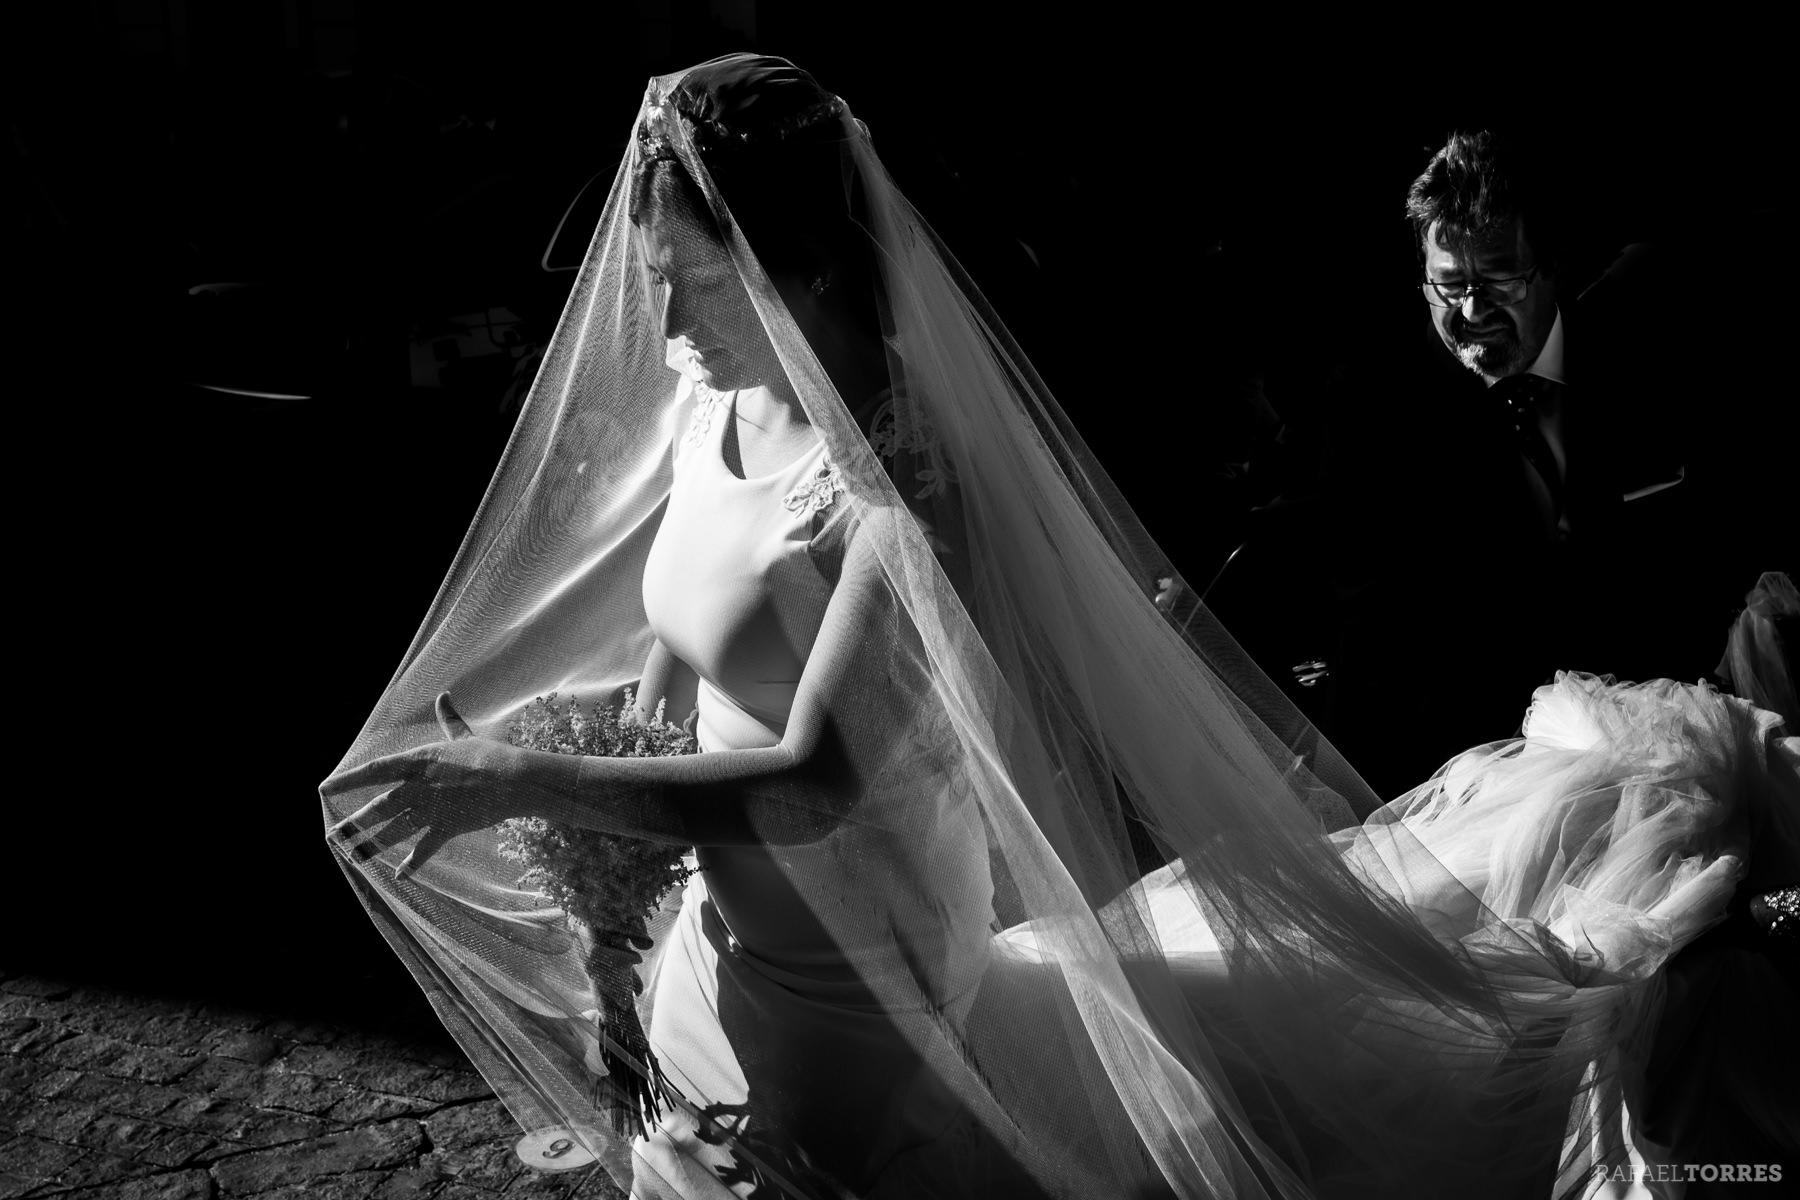 bea-juan-carmona-fotografo-boda-en-sevilla-rafael-torres-photo-29.jpg